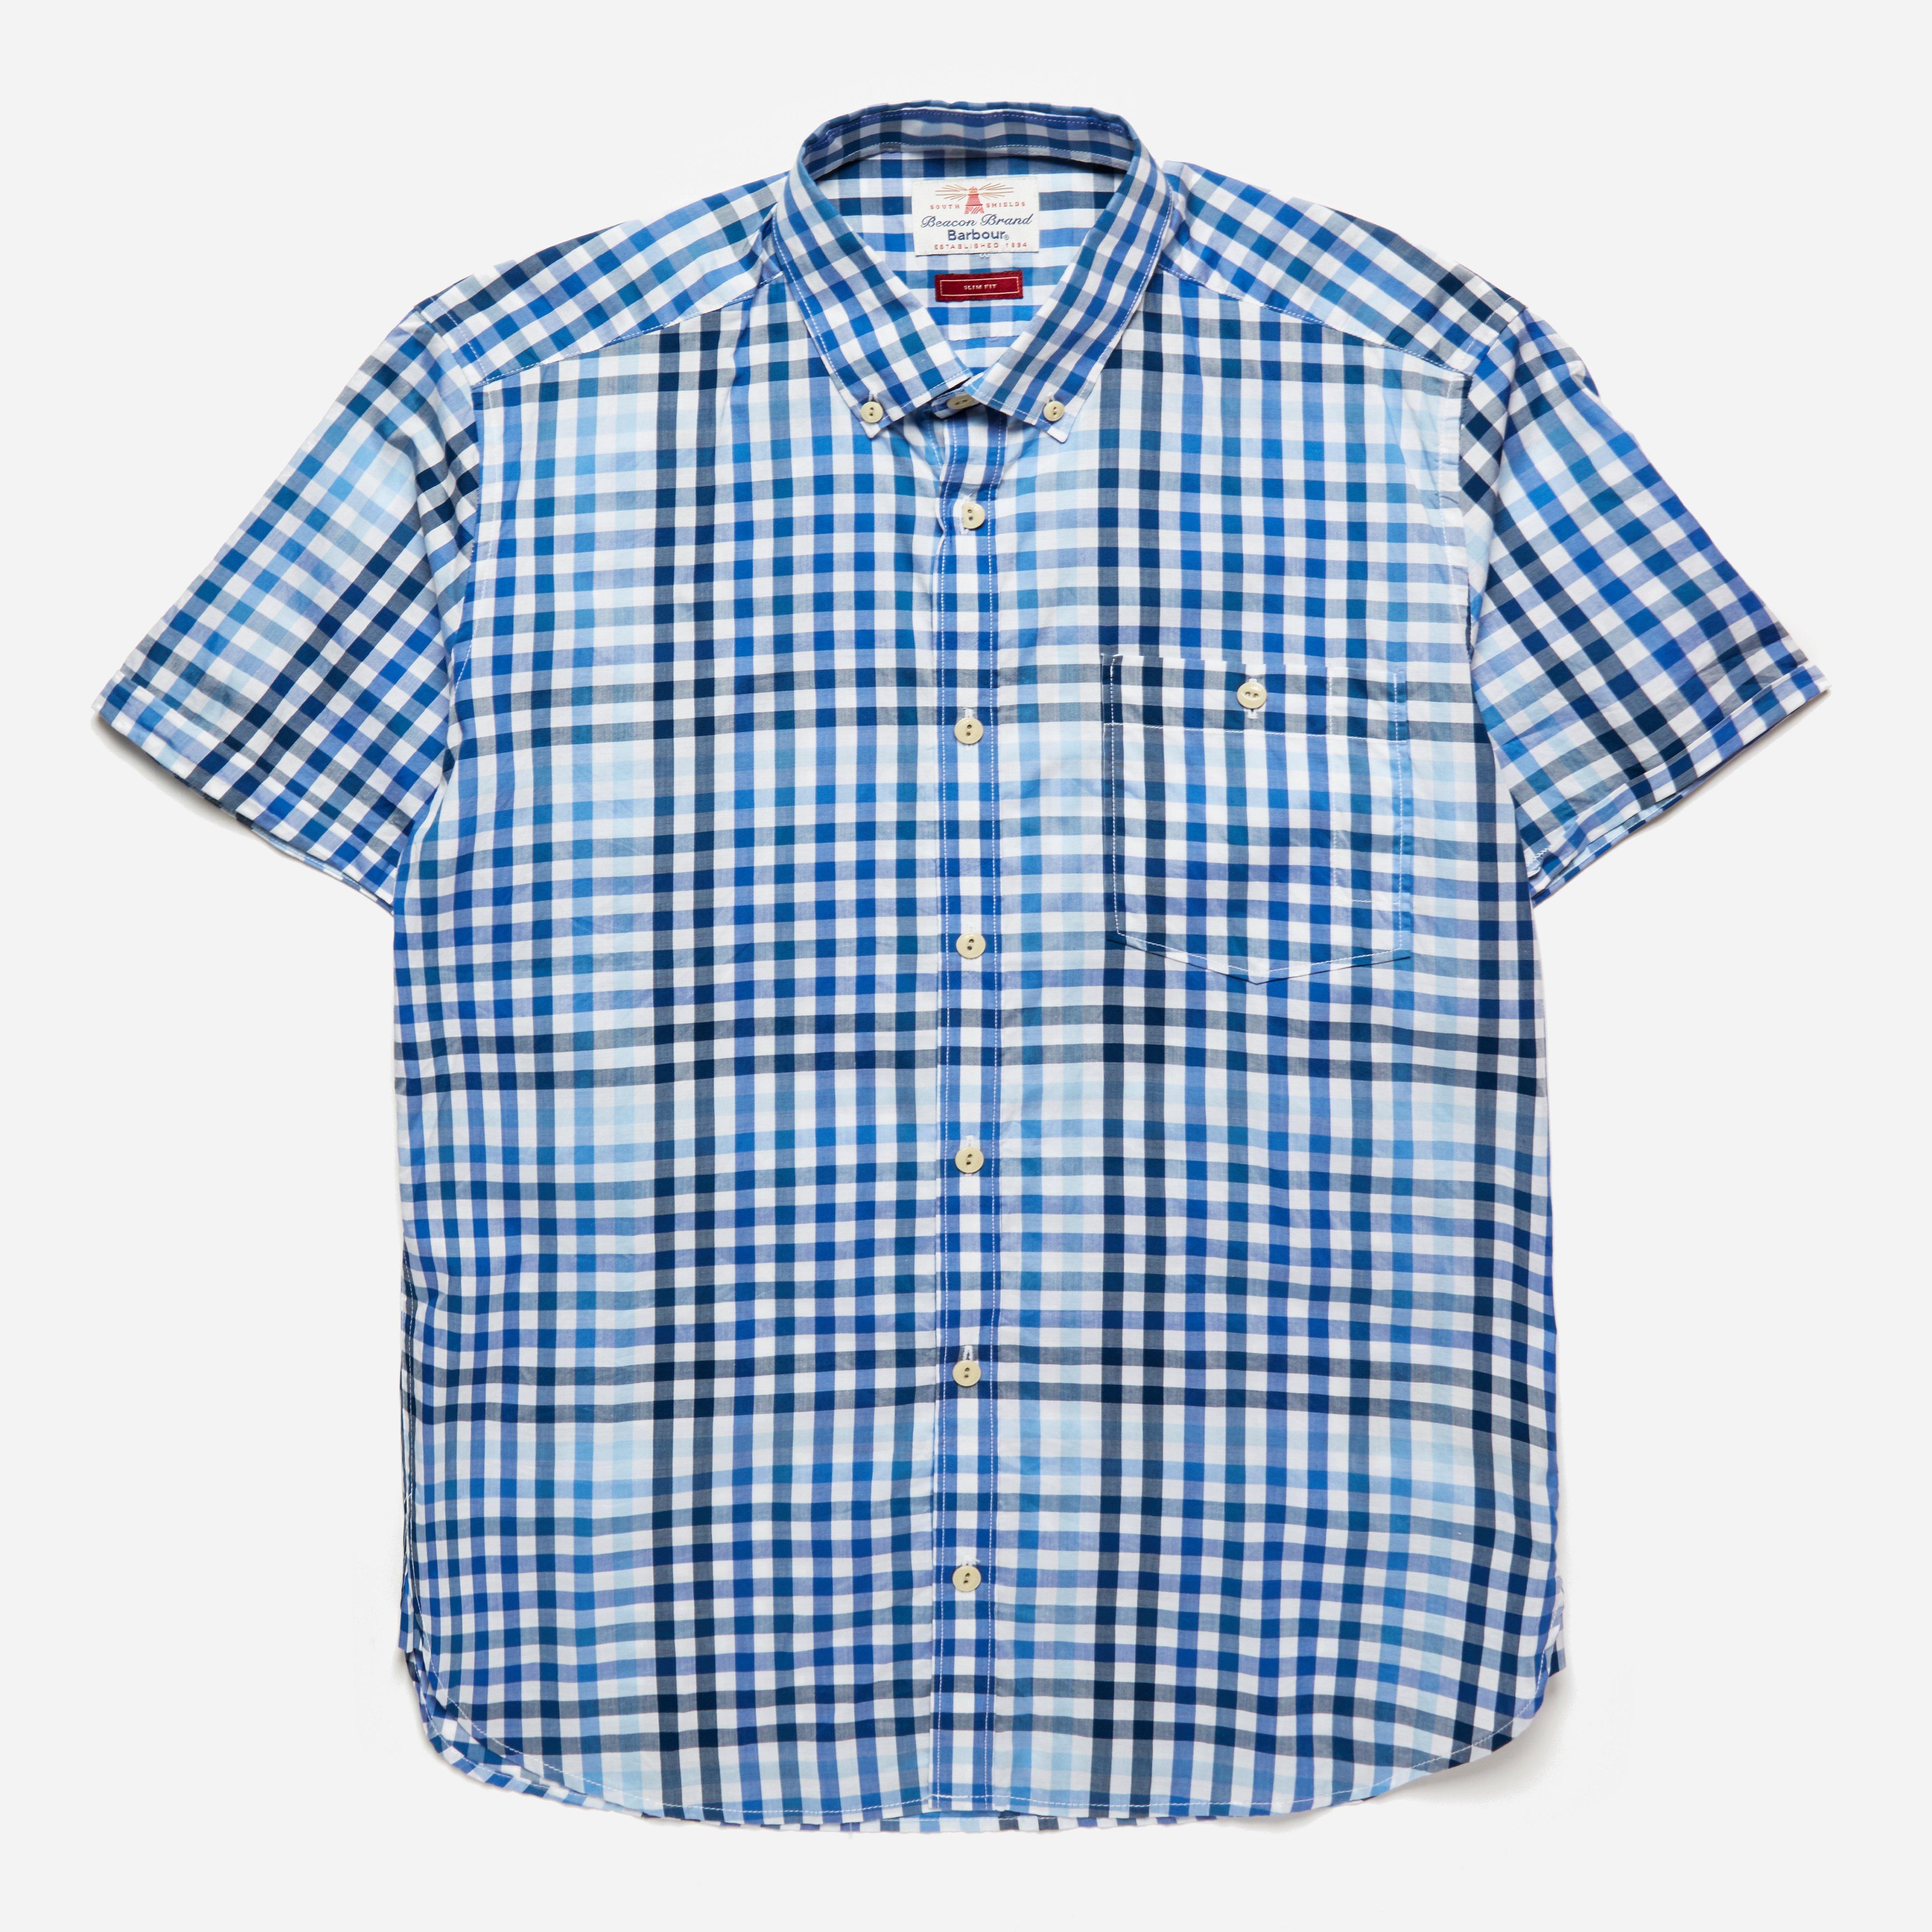 Barbour James Tatterall Shirt